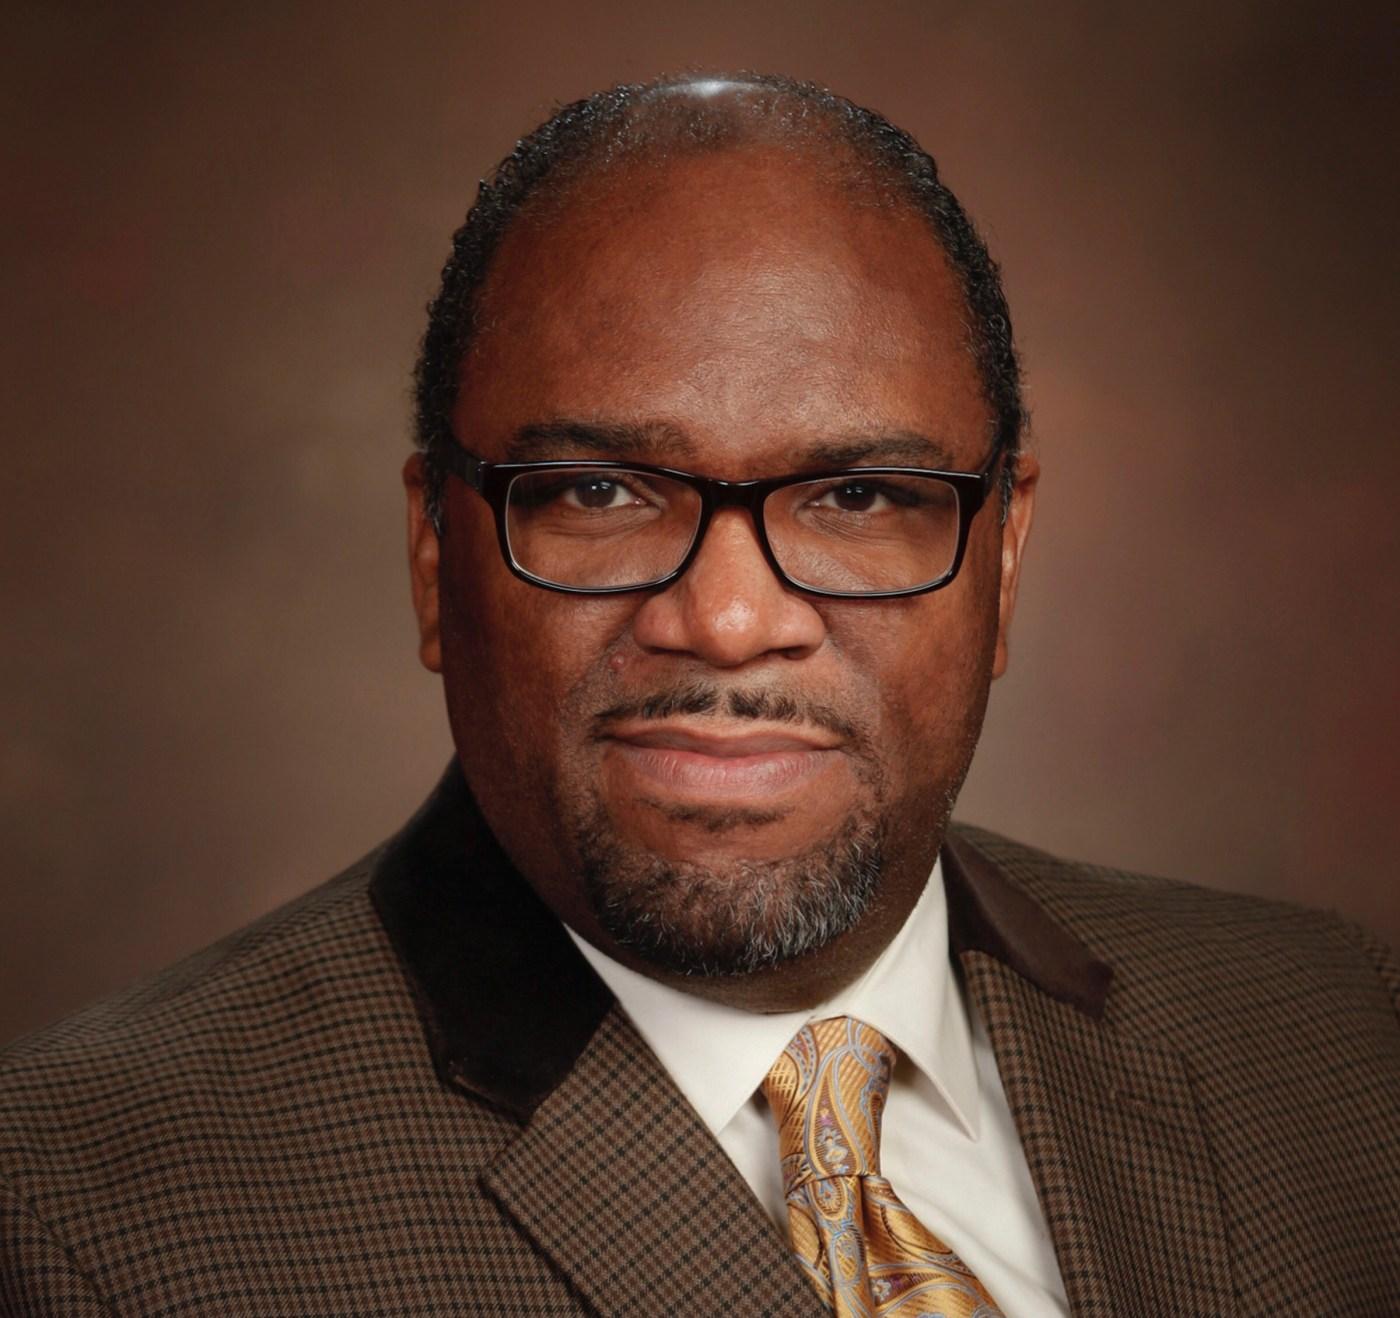 Birmingham pastor